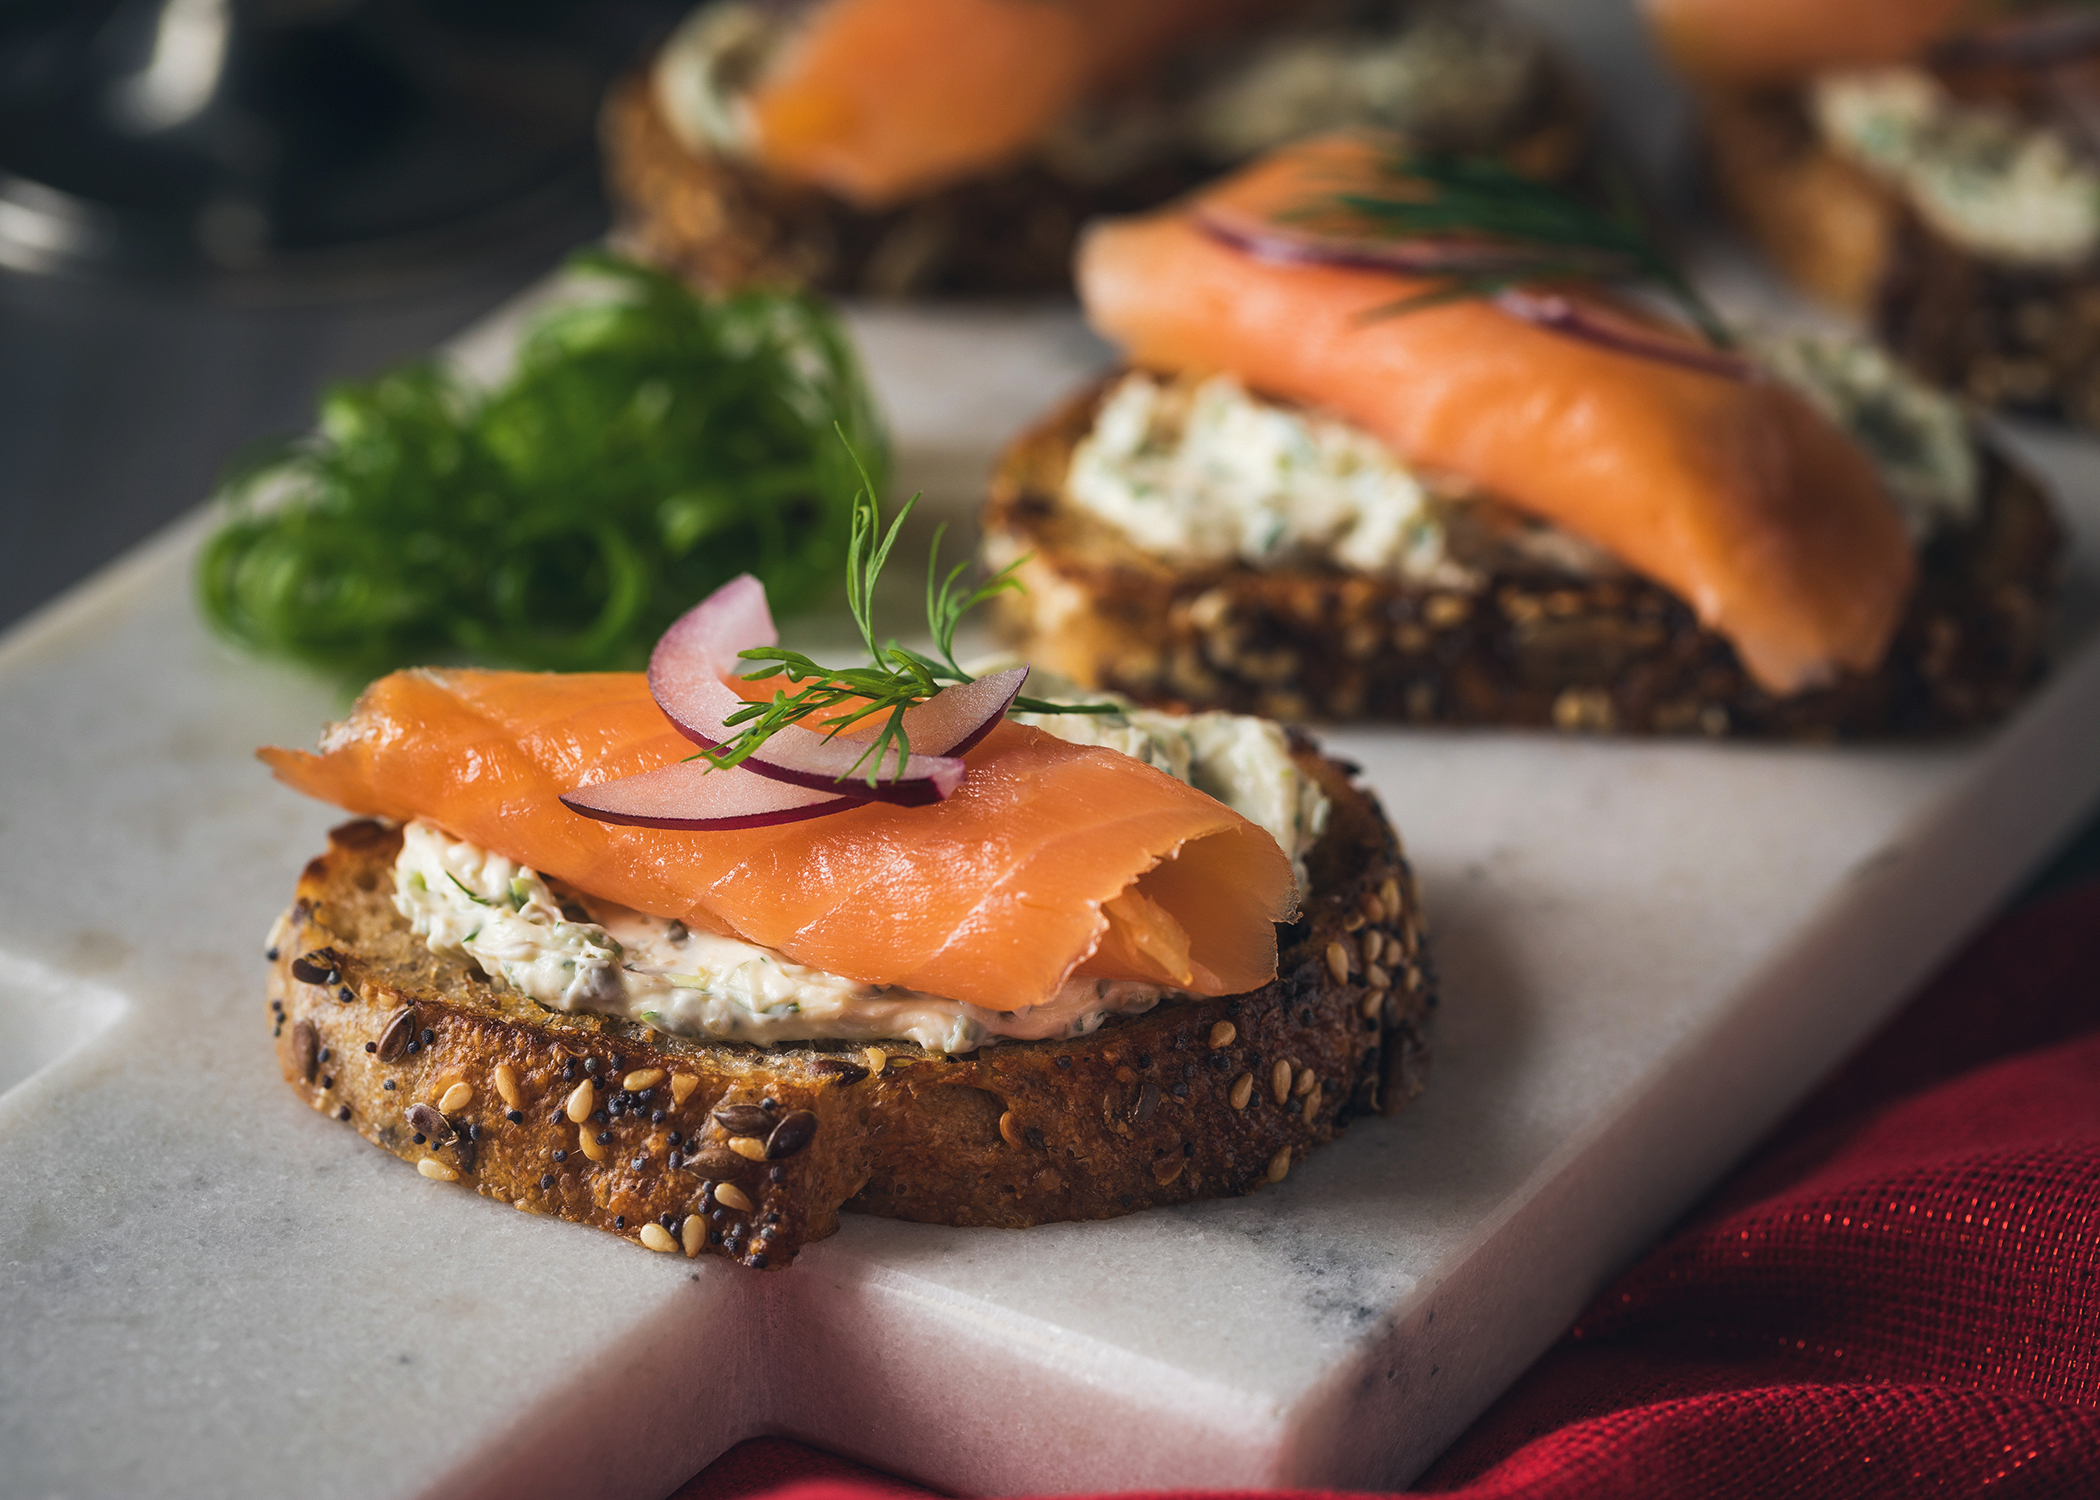 Smoked_Salmon_With_Scallion_Cream_Cheese_Mini_Toasts_006_MWG.jpg